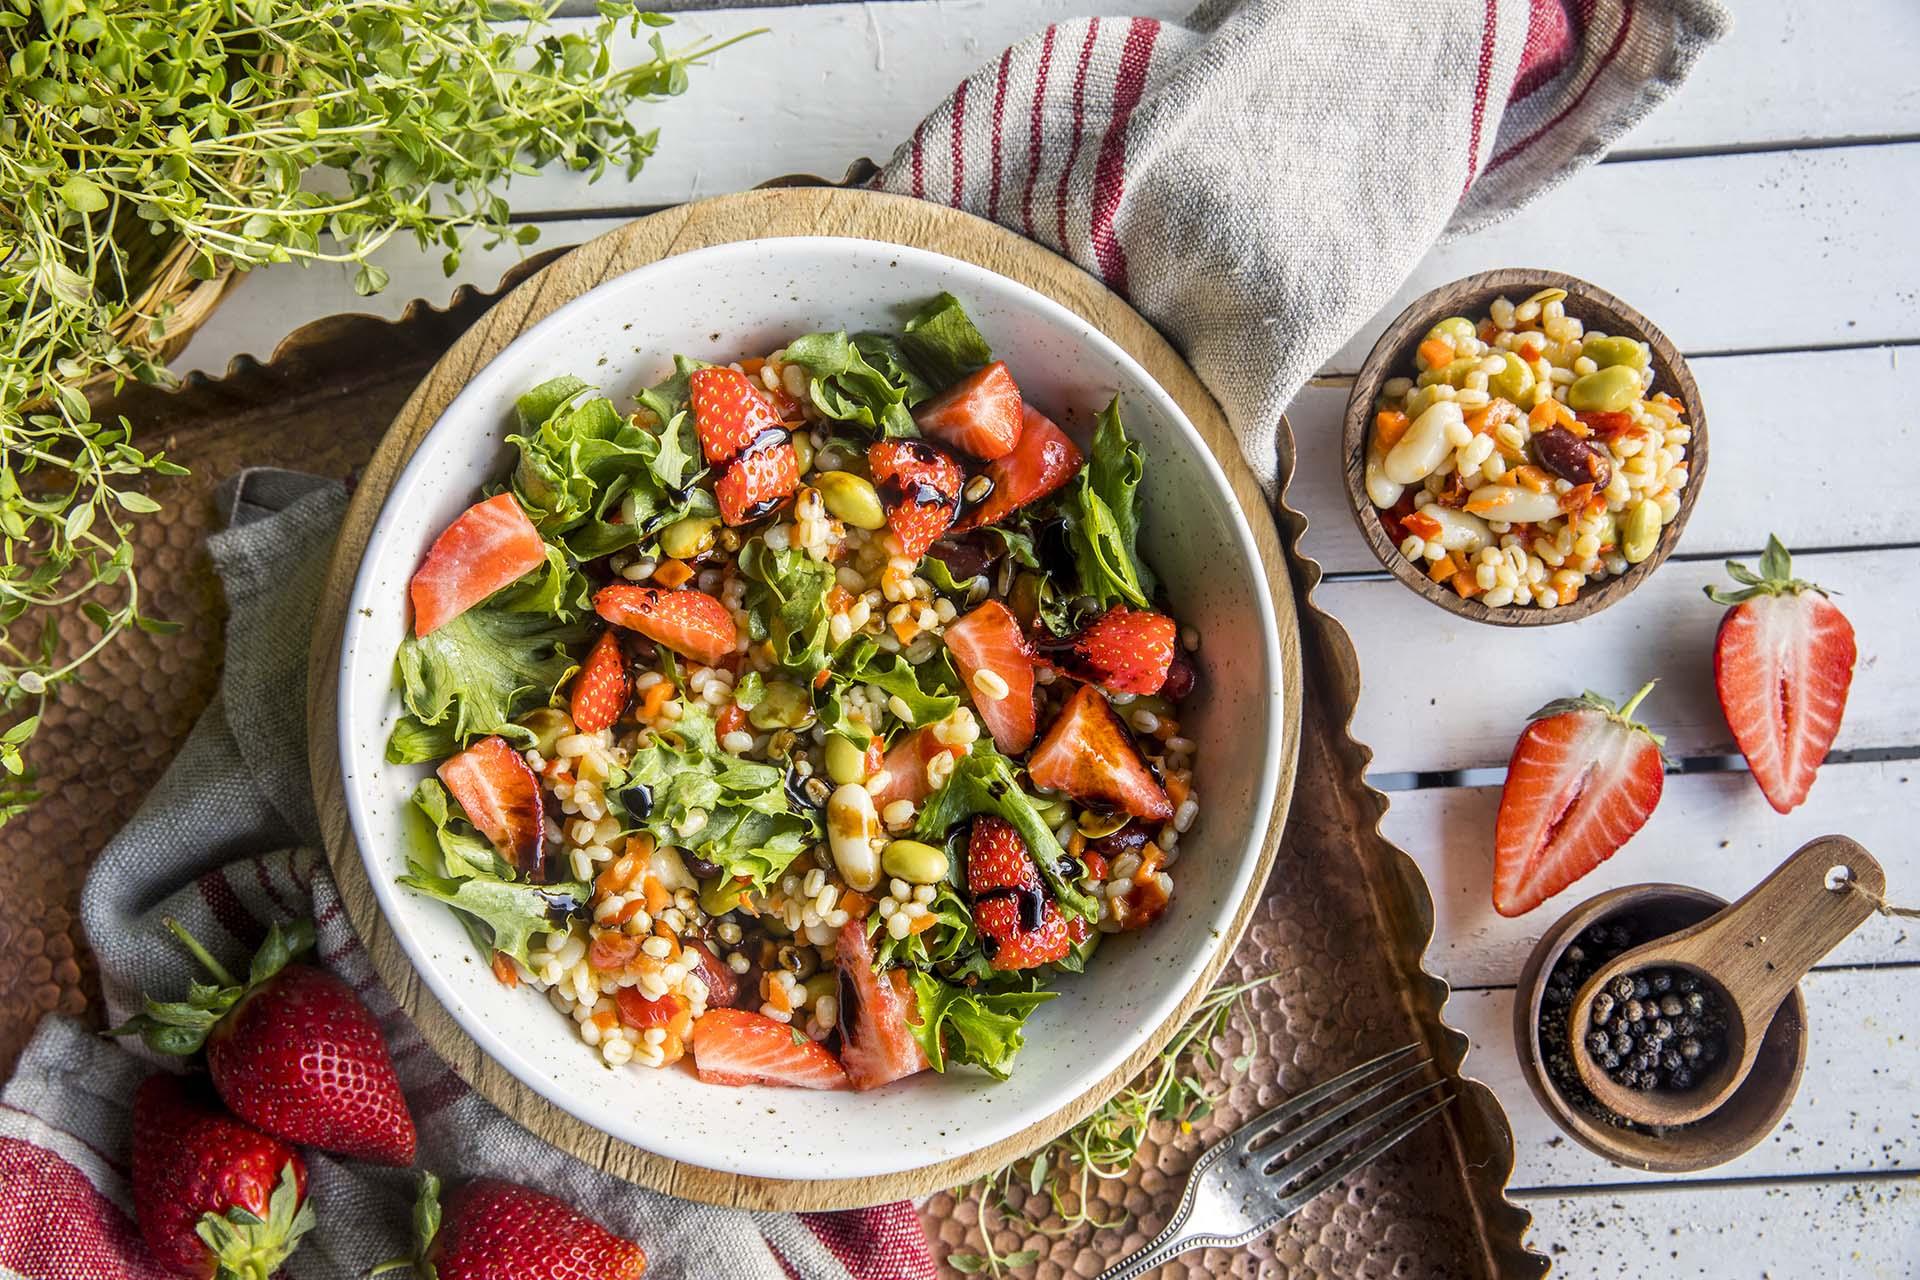 Jordbærsalat med bygg og linser